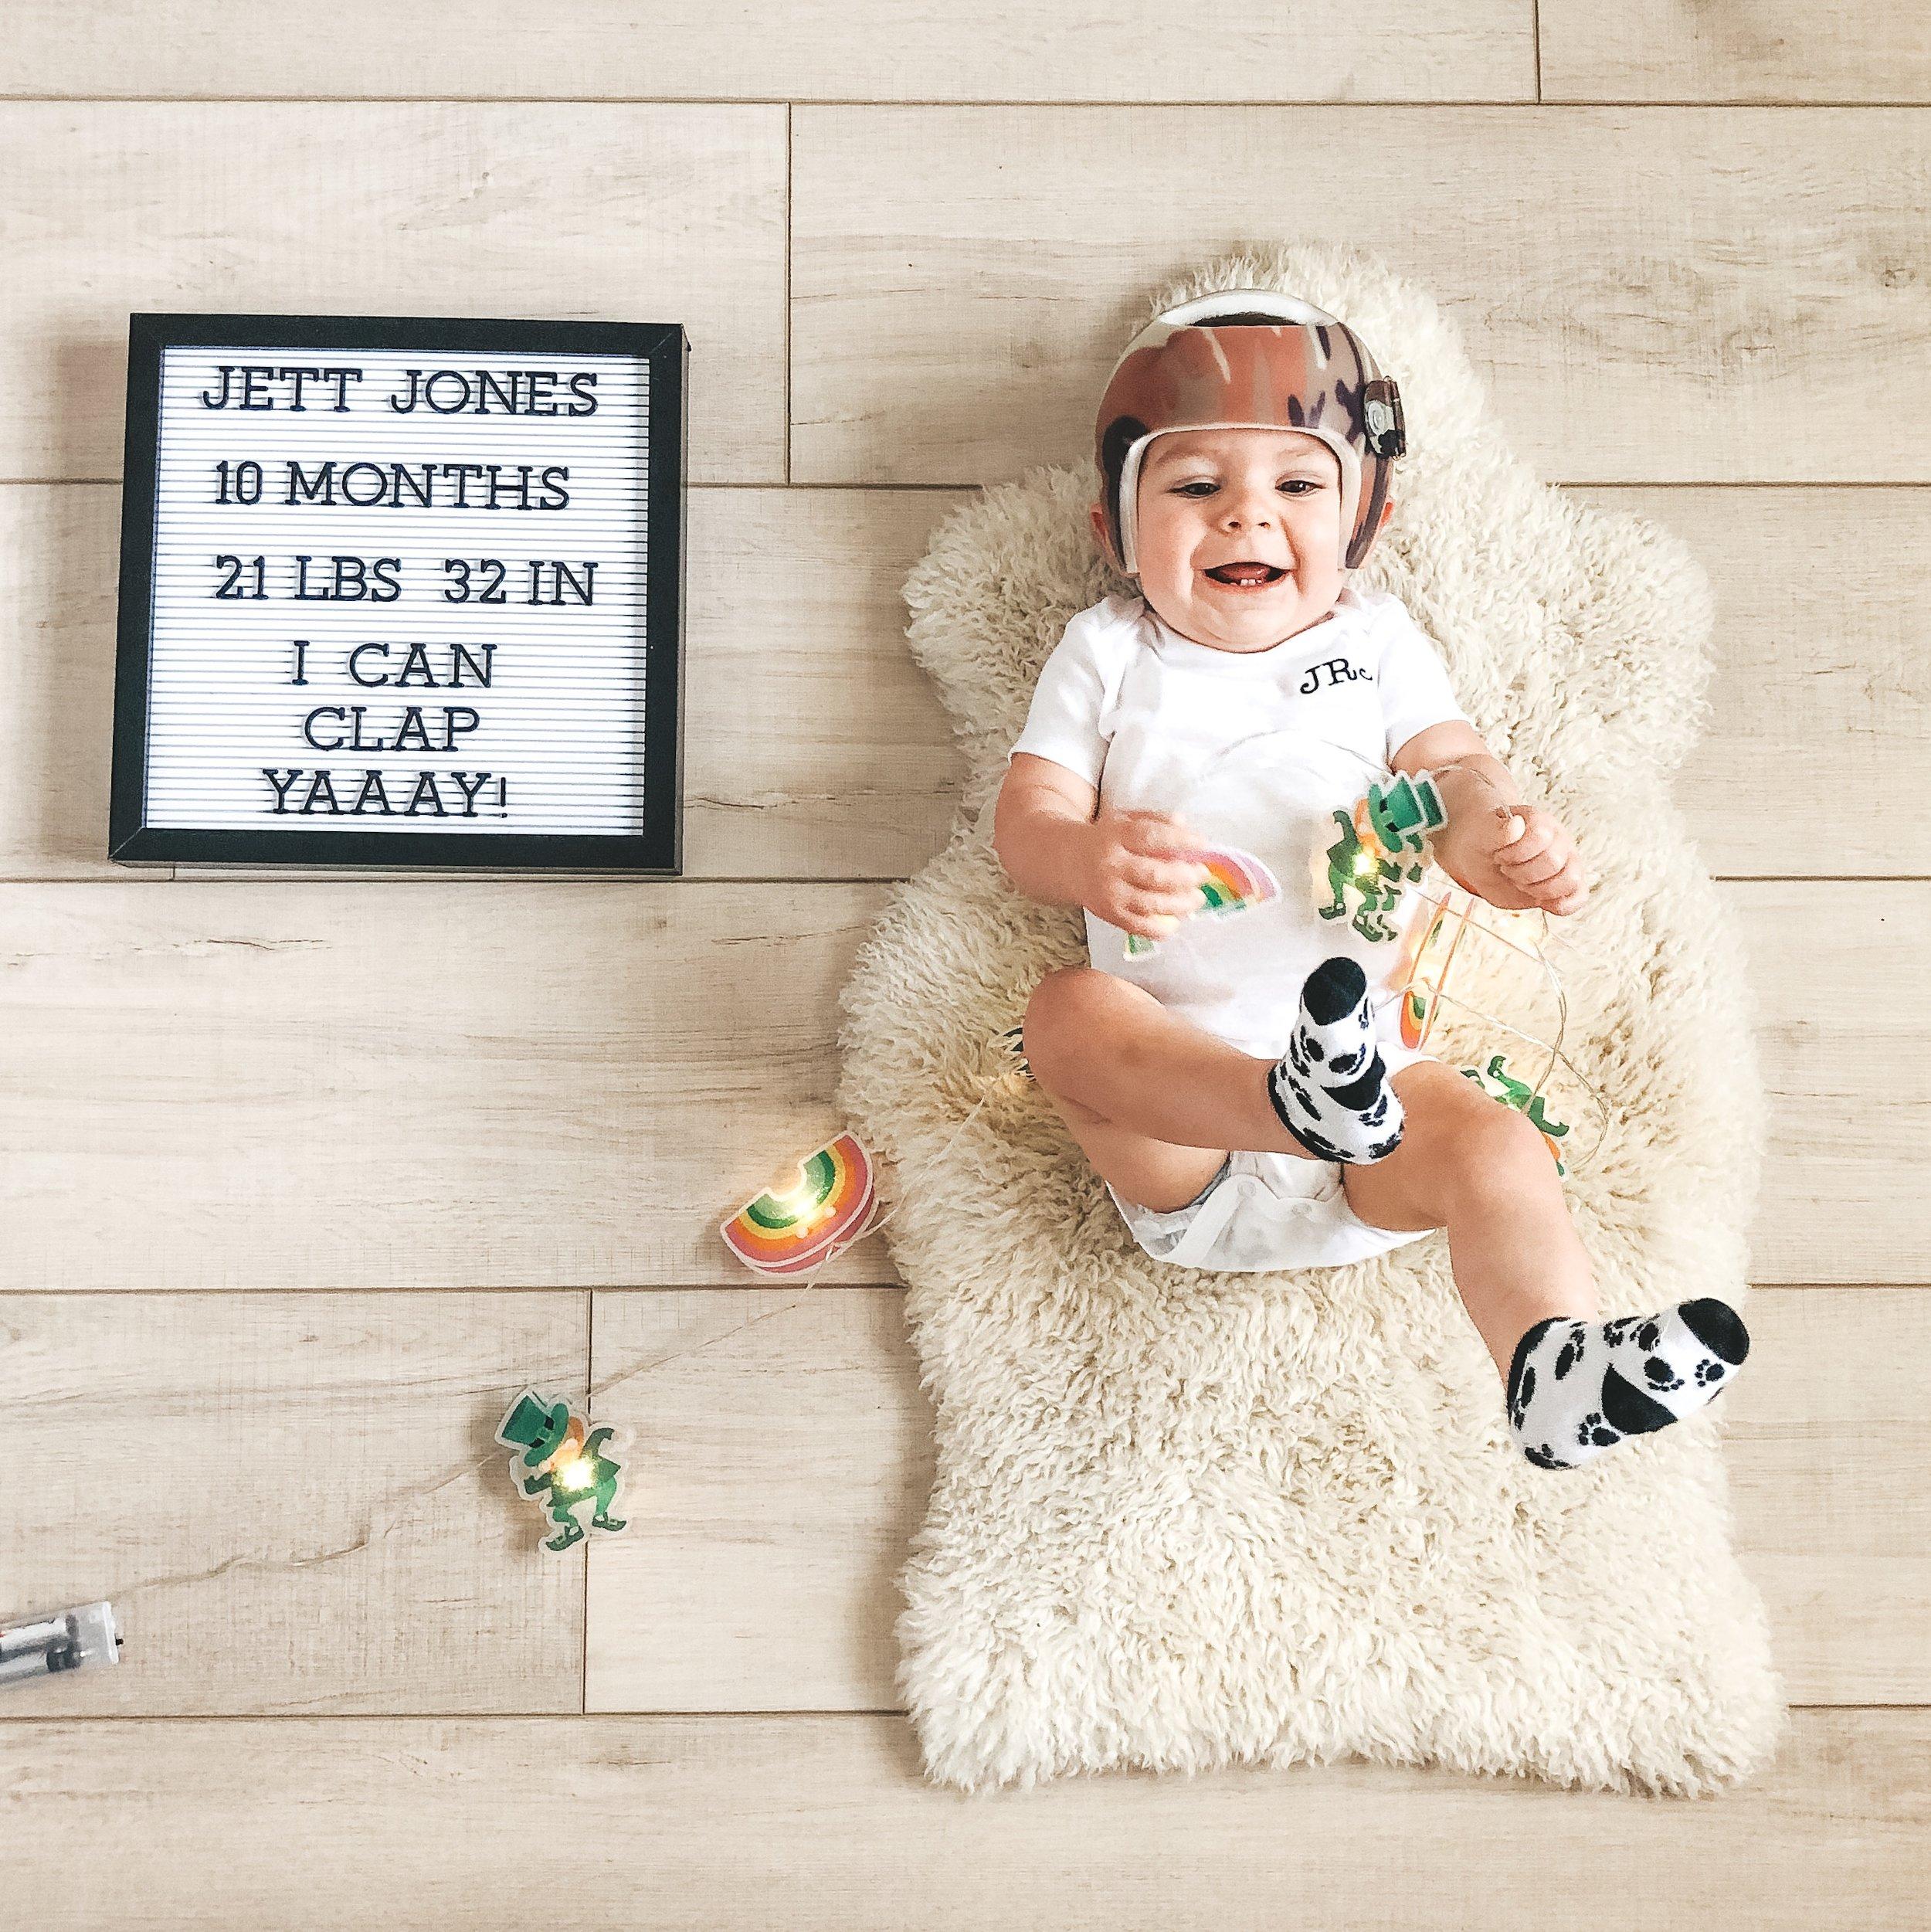 Jett Jones 10 months old.  Monthly photos in March.